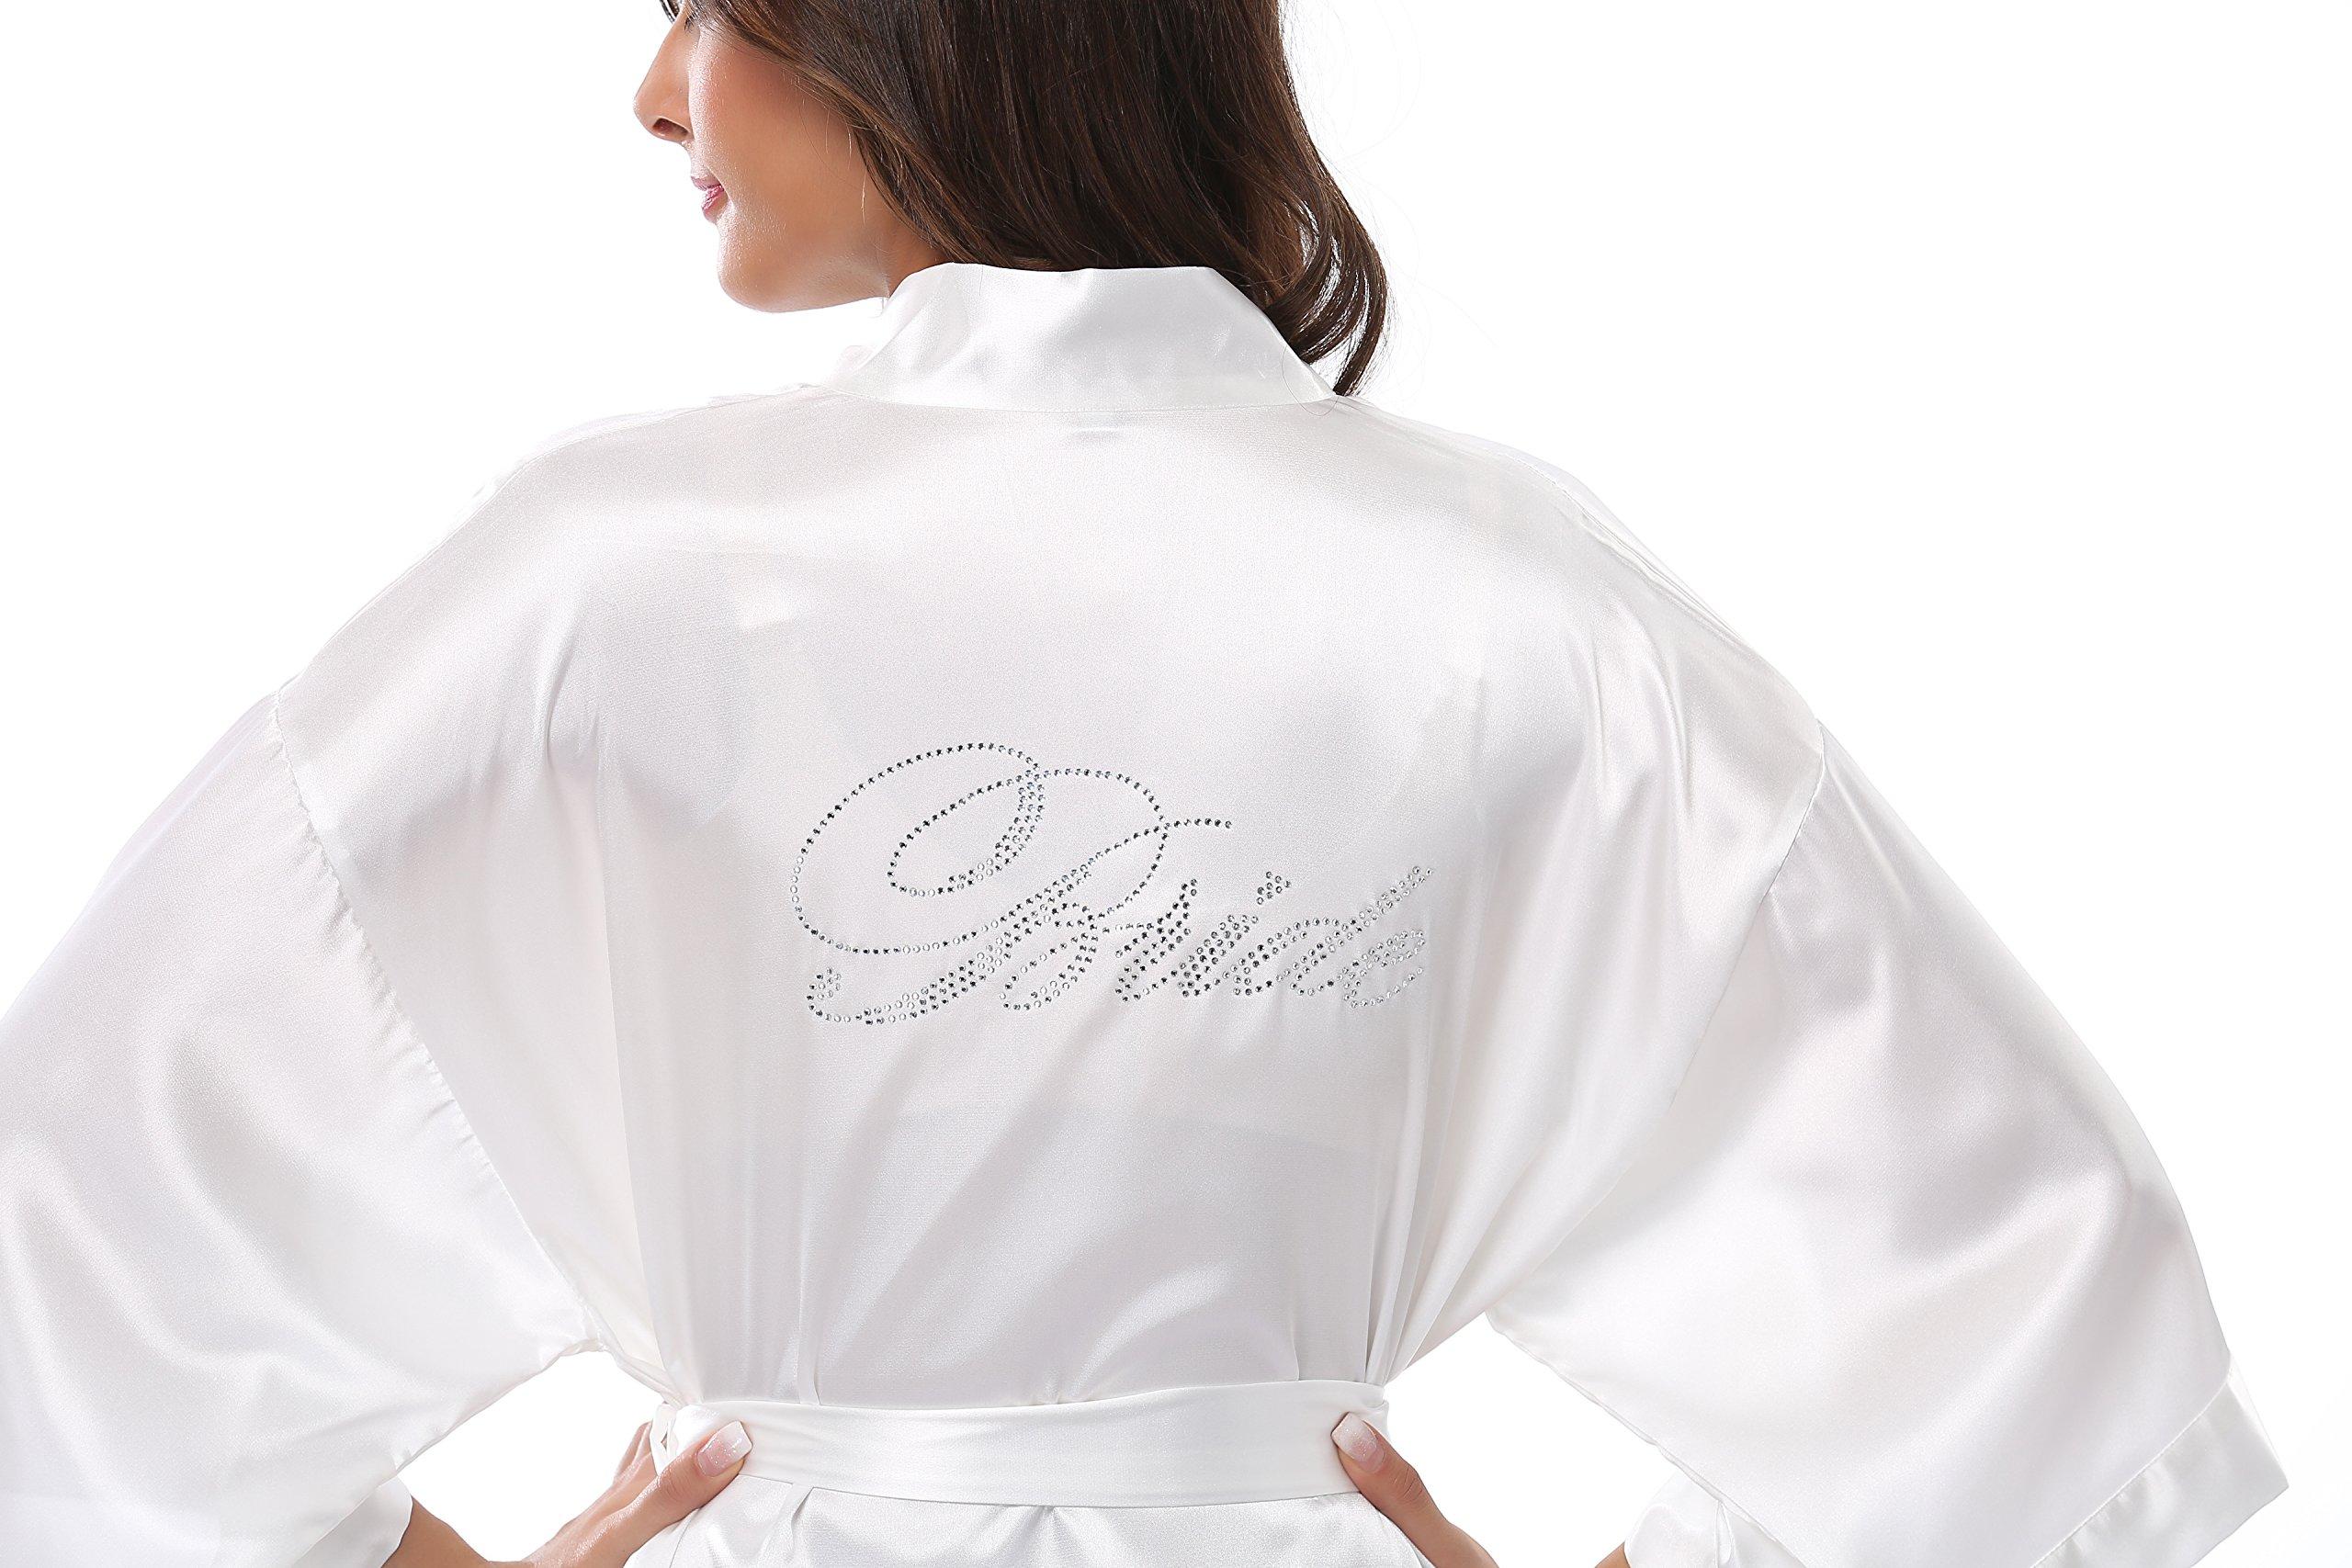 Vogue Bridal Women's Satin Rhinestone Short Wedding Kimono Robe for Bride, M